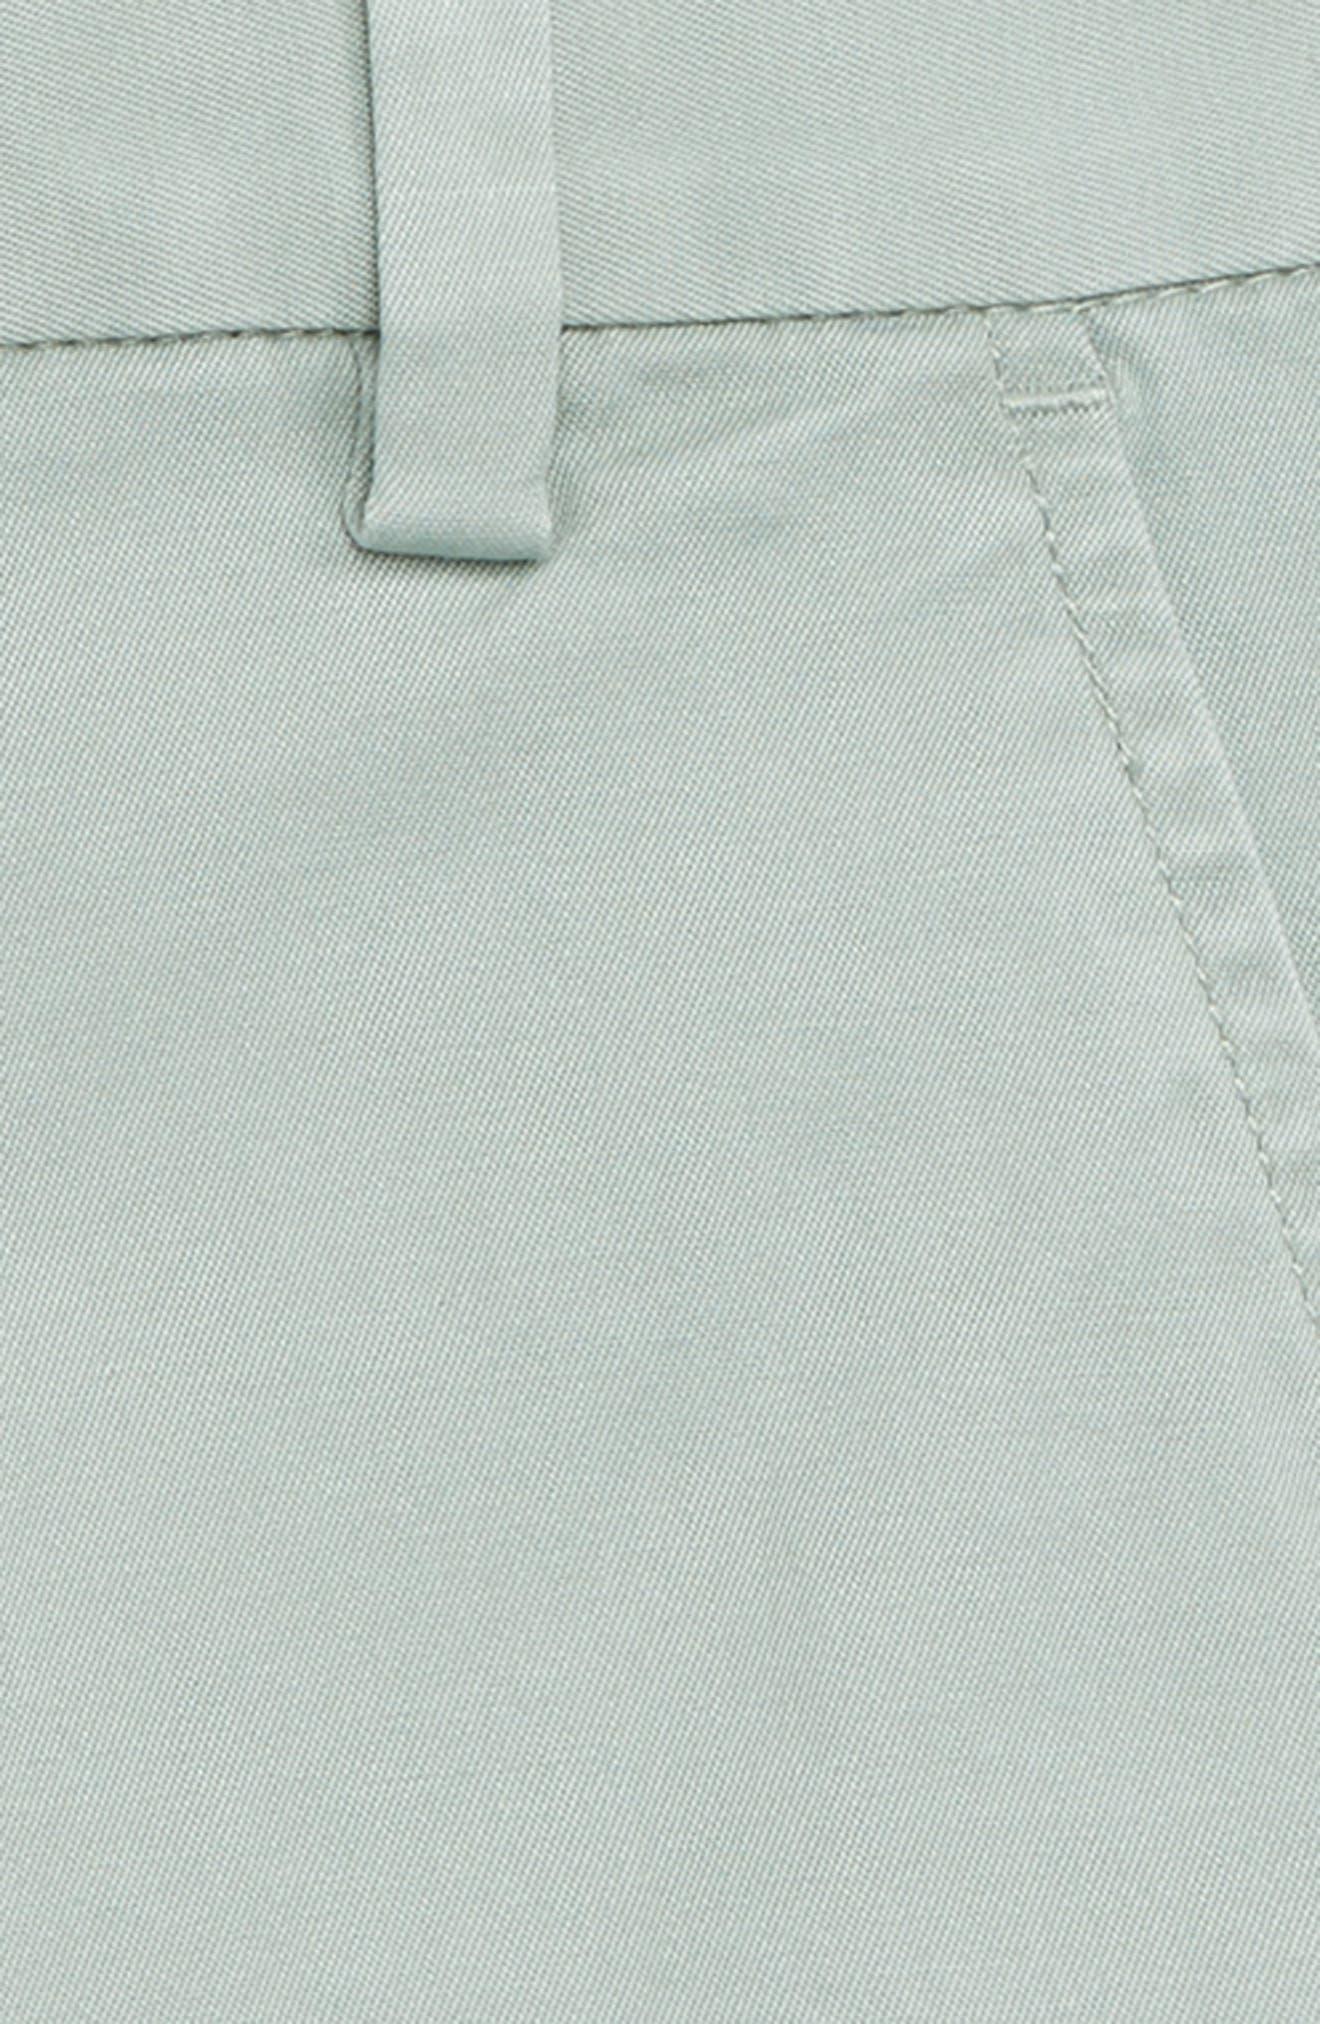 Stretch Breaker Shorts,                             Alternate thumbnail 2, color,                             020